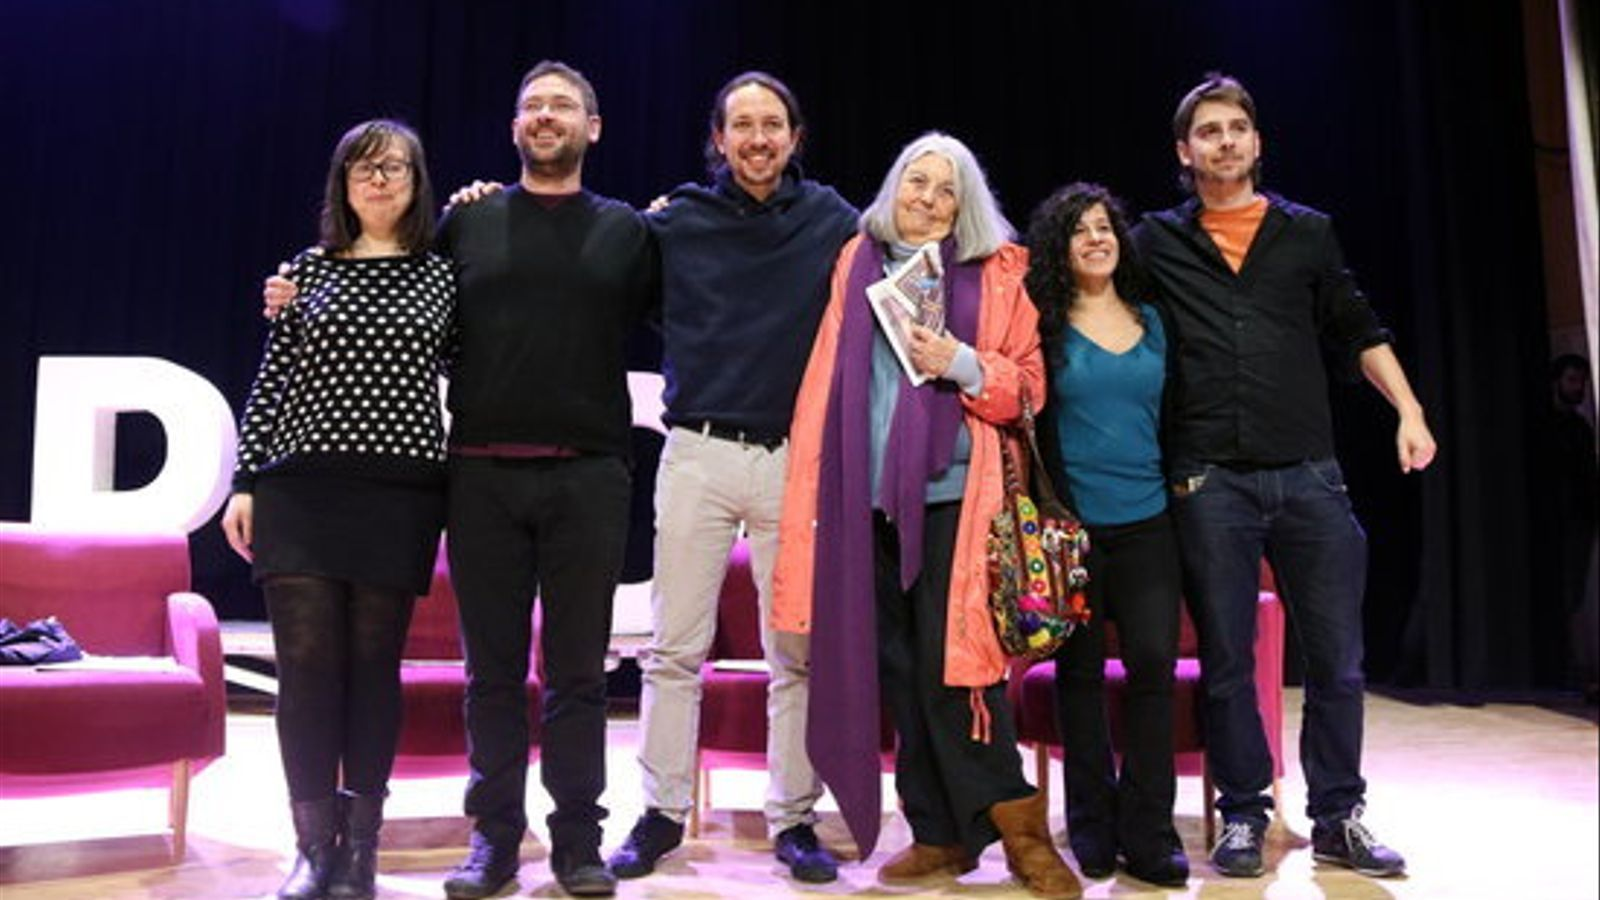 Pablo Iglesias, al costat d'Albano Fachin i també Noelia Bail, l'any 2017